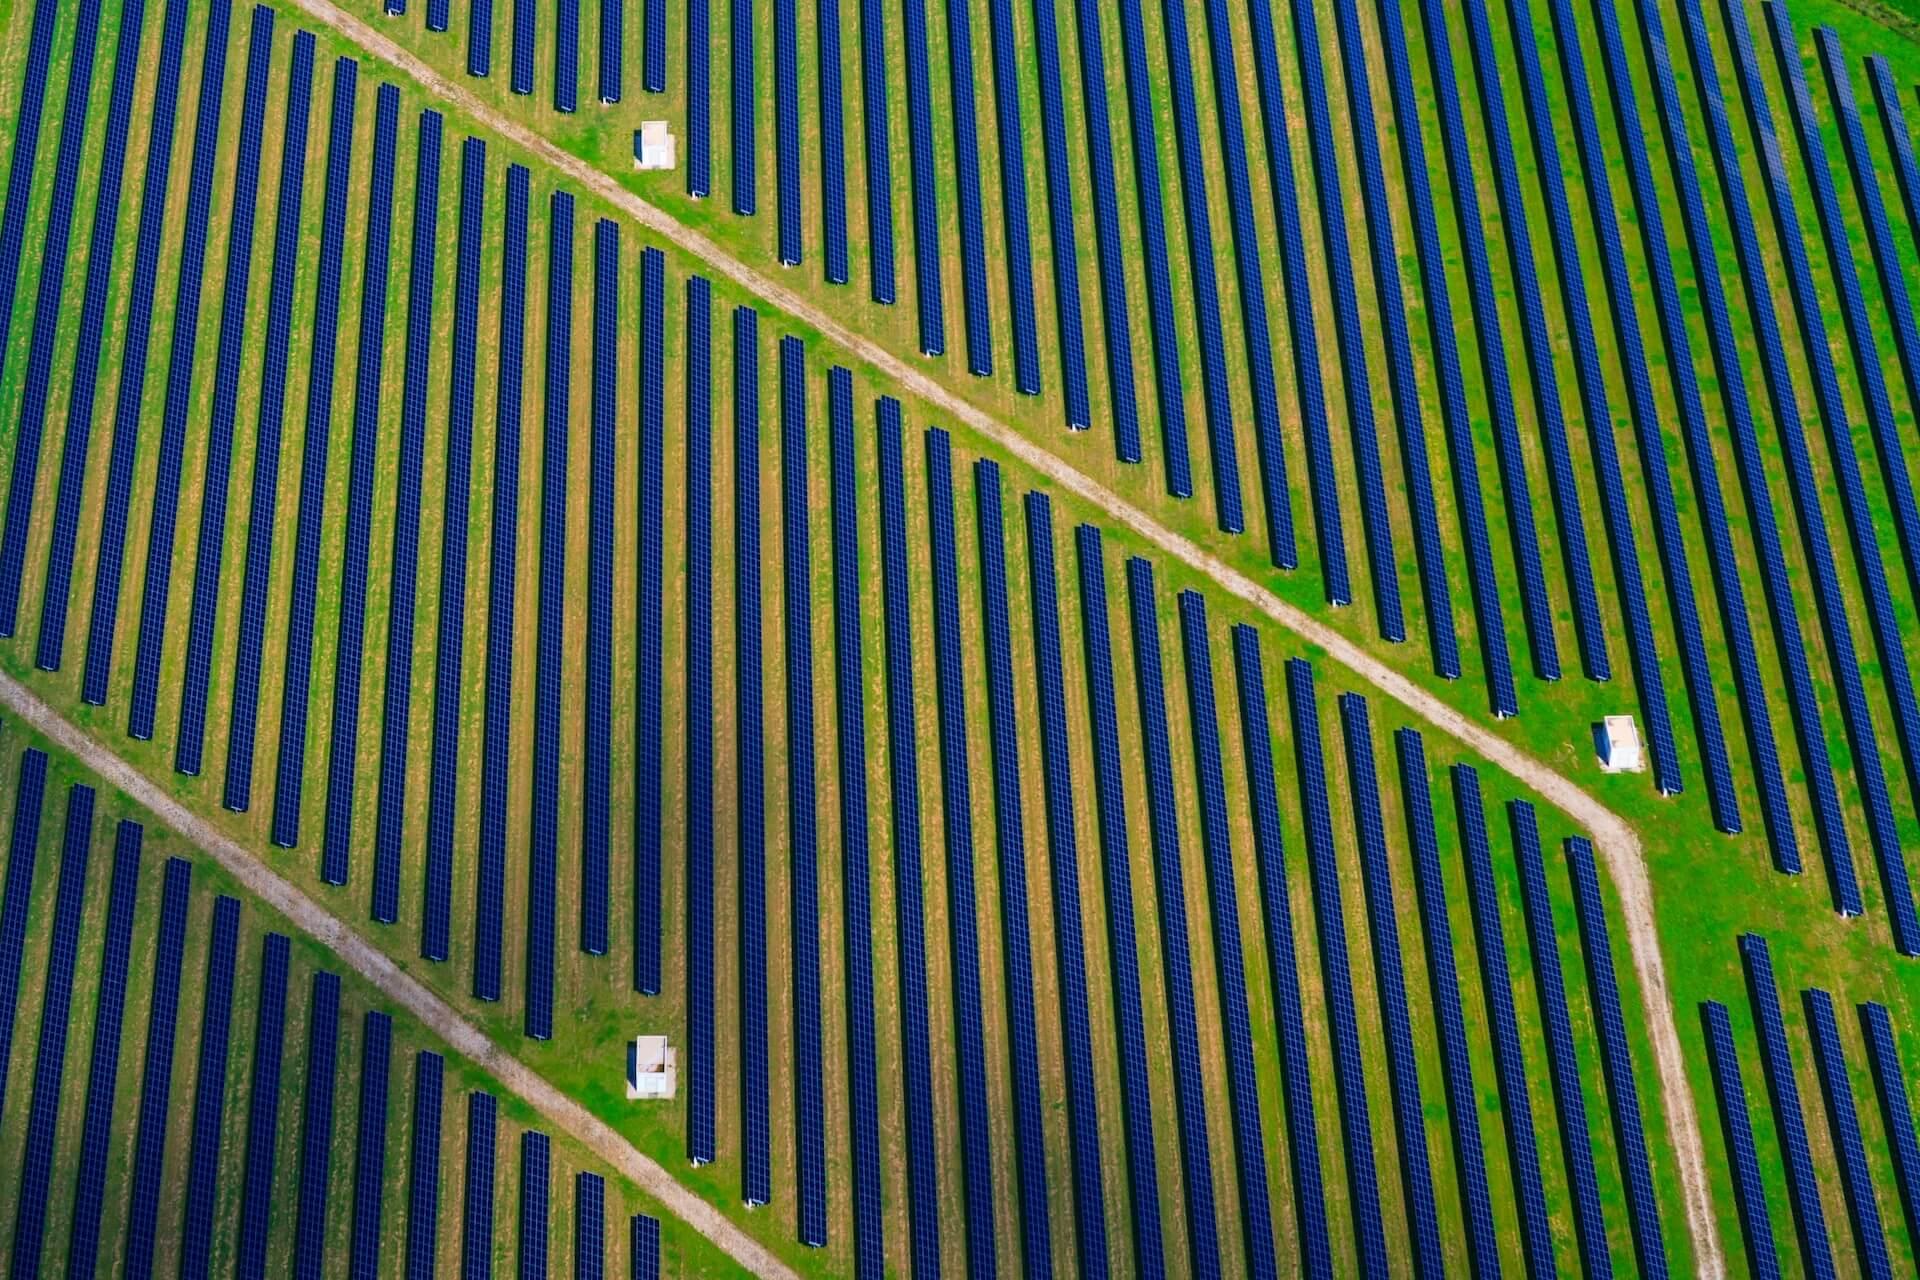 solar-power-plant-bavaria-germany